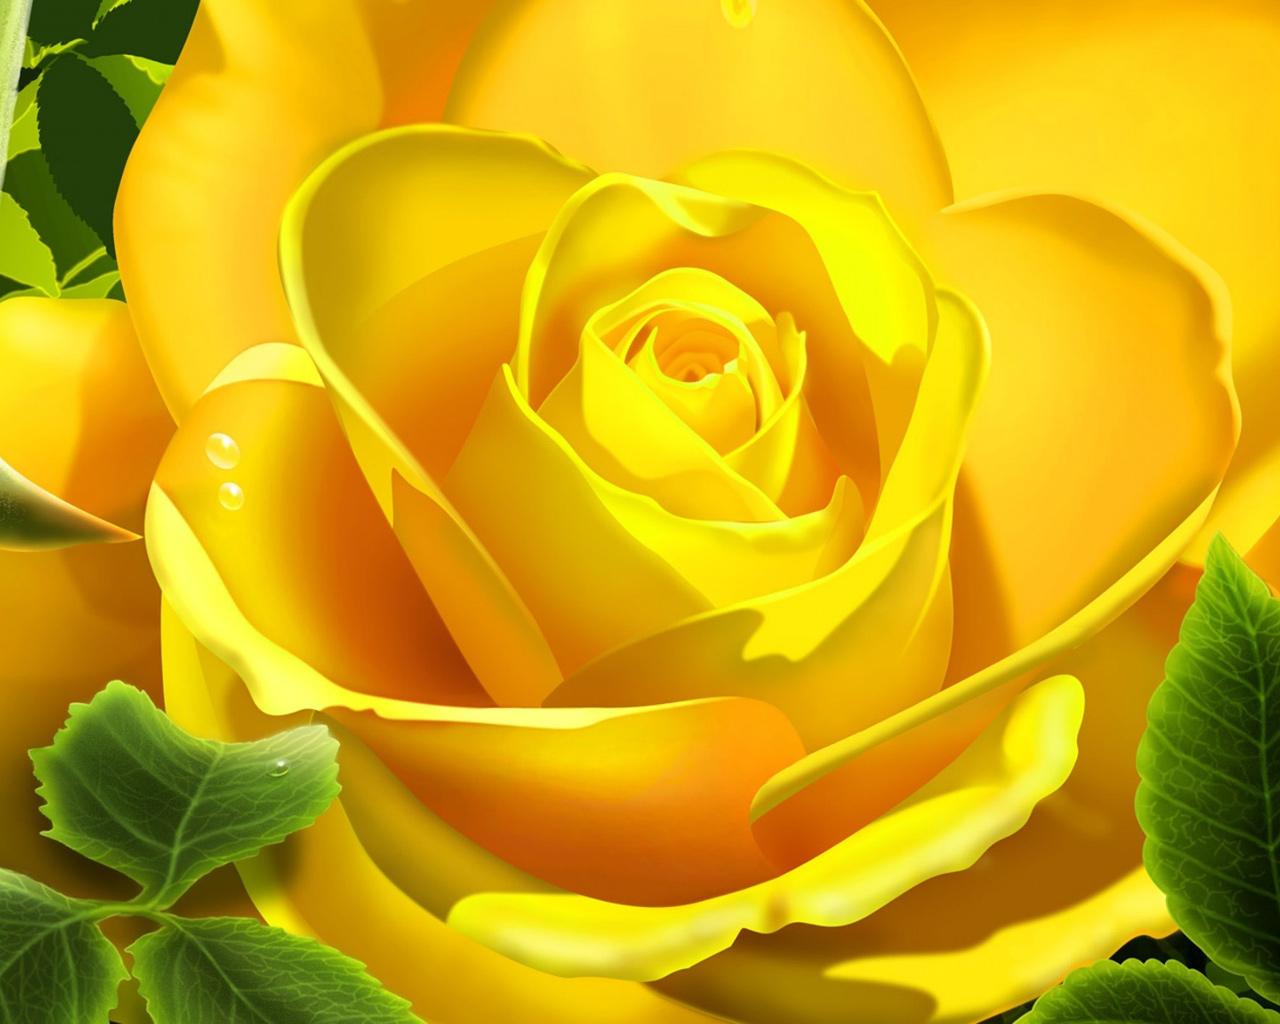 http://1.bp.blogspot.com/_a5mK001oySU/TOXFnzOyx0I/AAAAAAAApjo/KtBmFgN4A_k/s1600/4.jpg